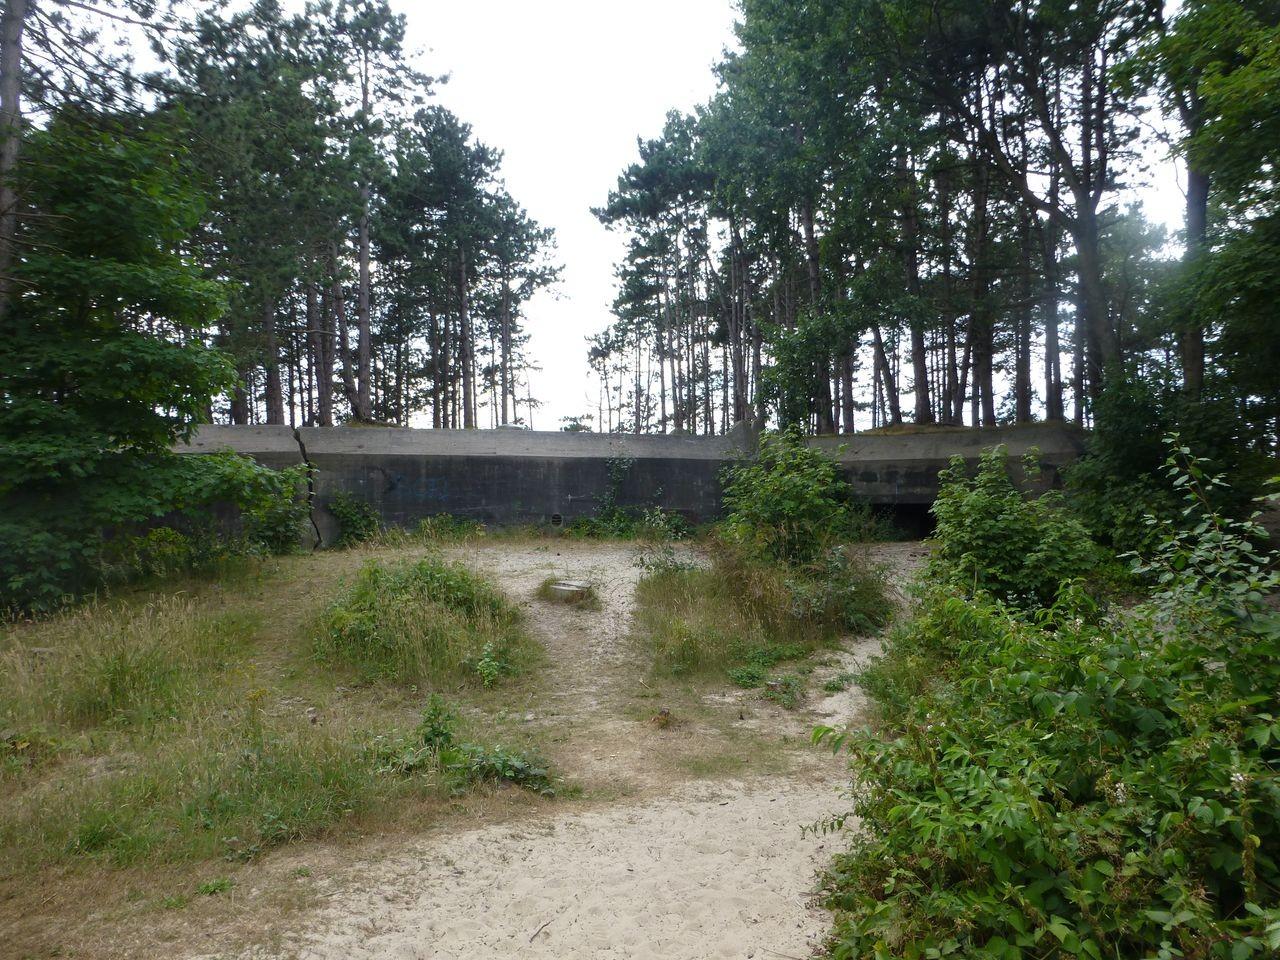 Haamstede bunker